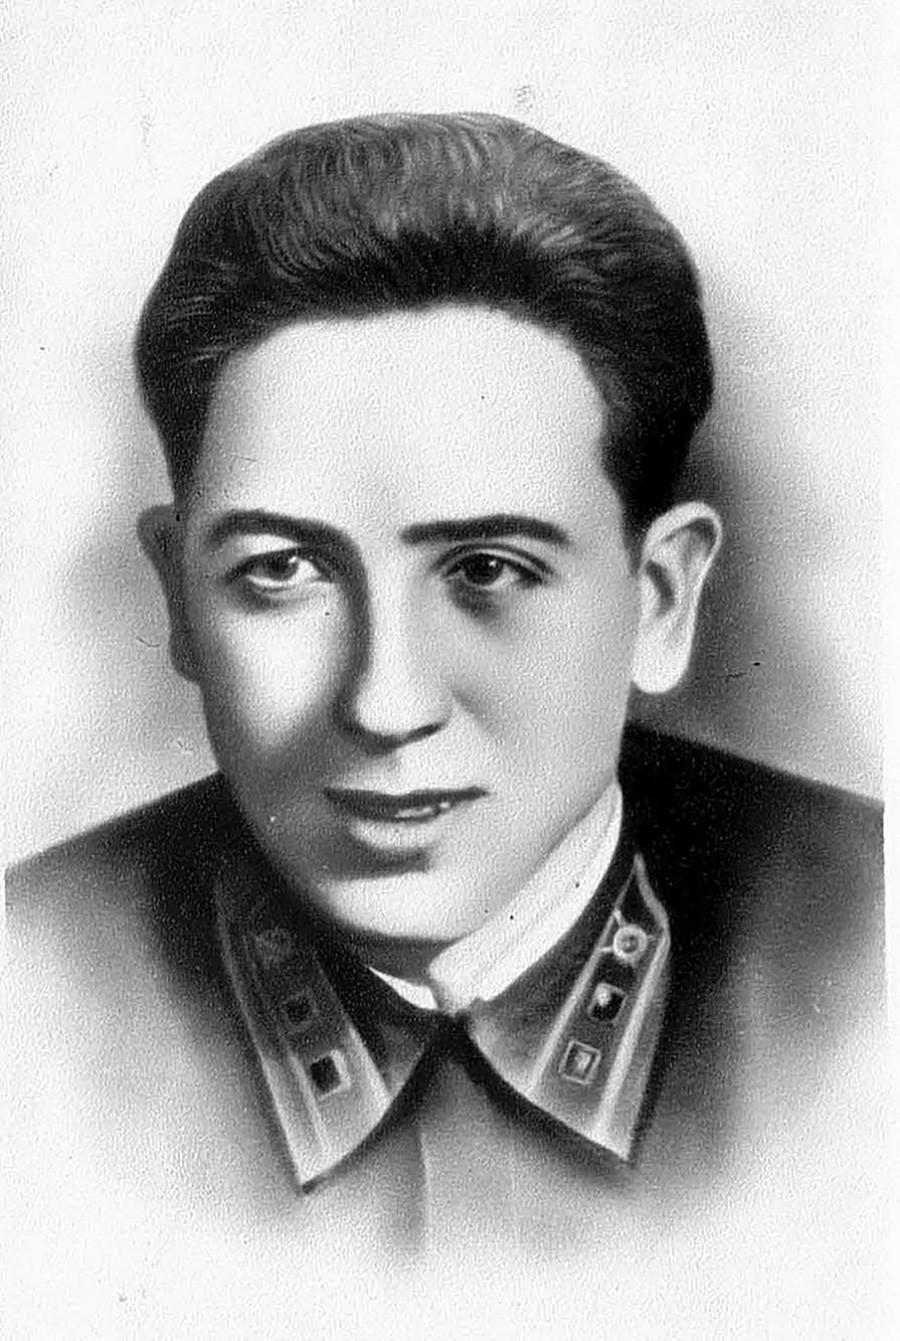 Ruben Ruiz Ibarruri.